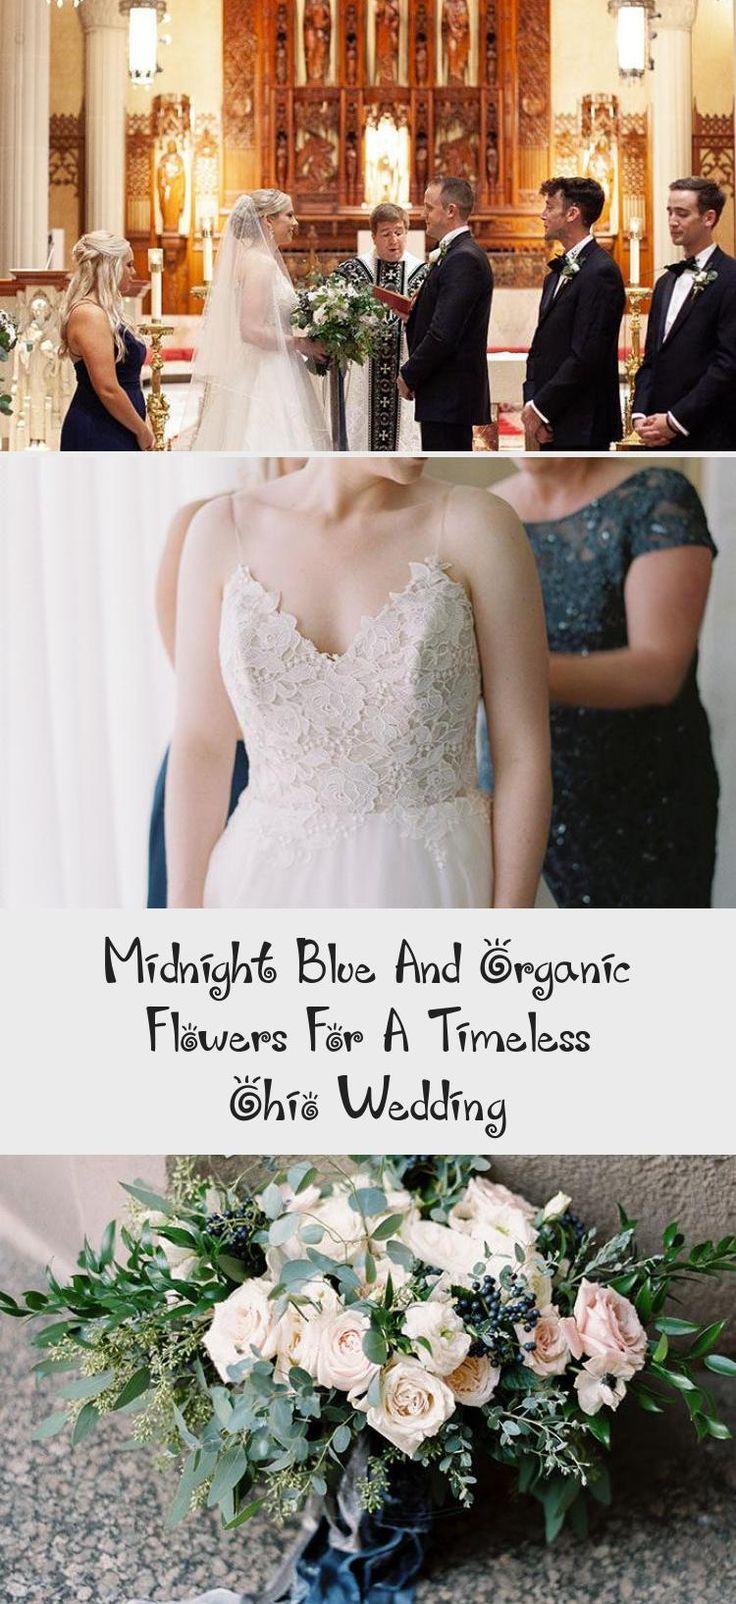 Midnight Blue Bridesmaid Dresses #BridesmaidDressesBoho #GreenBridesmaidDresses #DifferentBridesmaidDresses #BridesmaidDressesTwoPiece #MaroonBridesmaidDresses